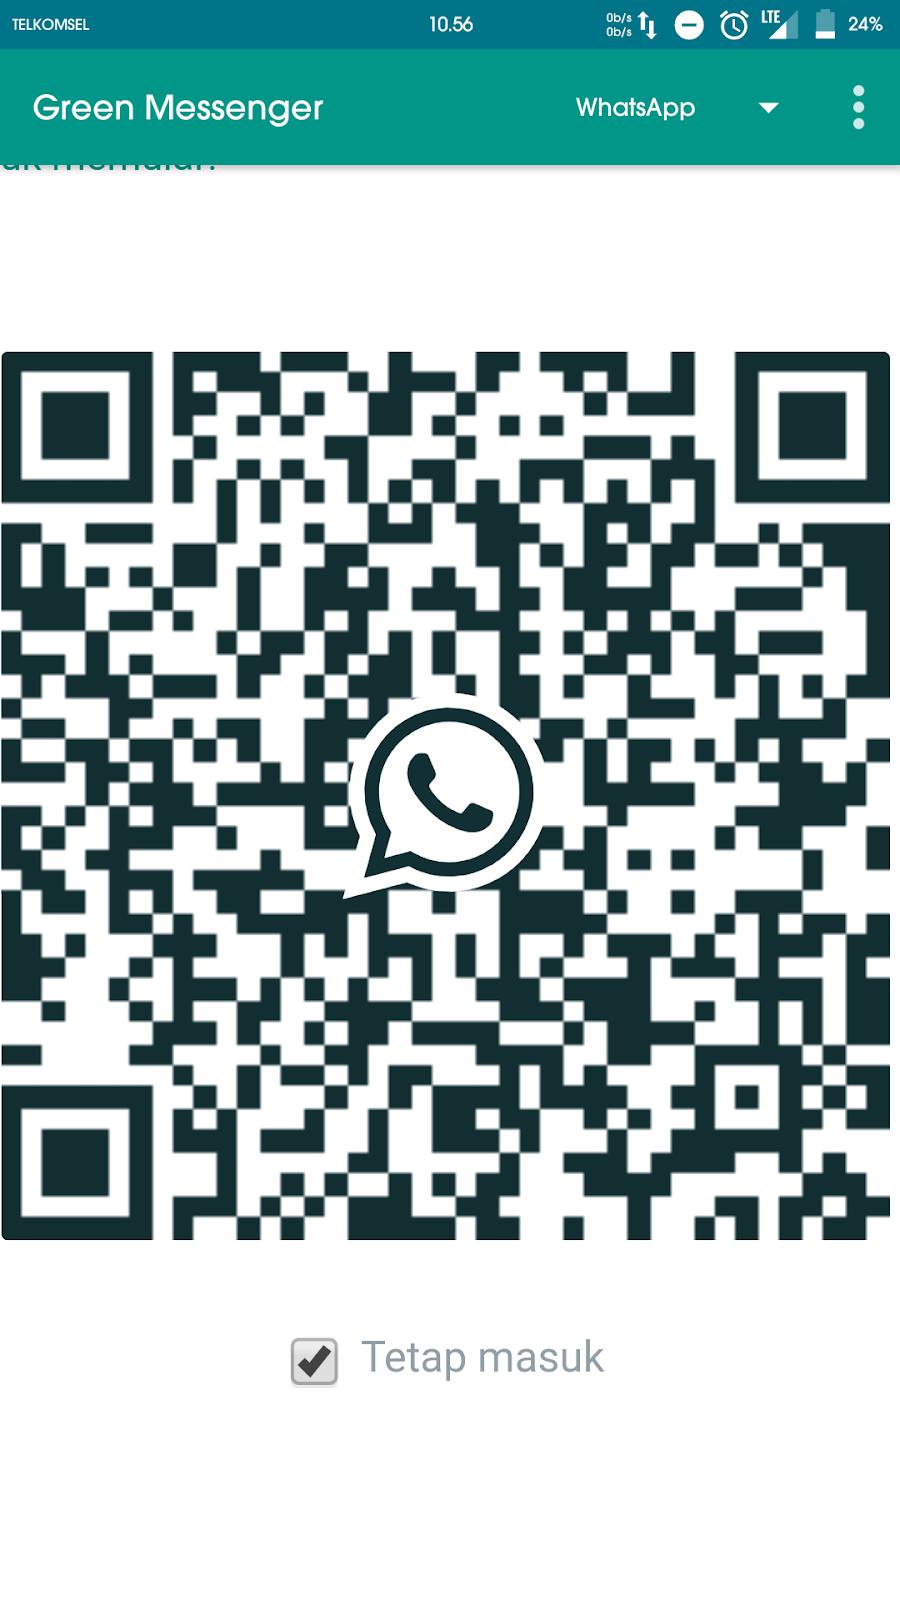 Pasanganmu selingkuh? Buruan sadap Whatsapp pacar kamu dengan aplikasi ini!